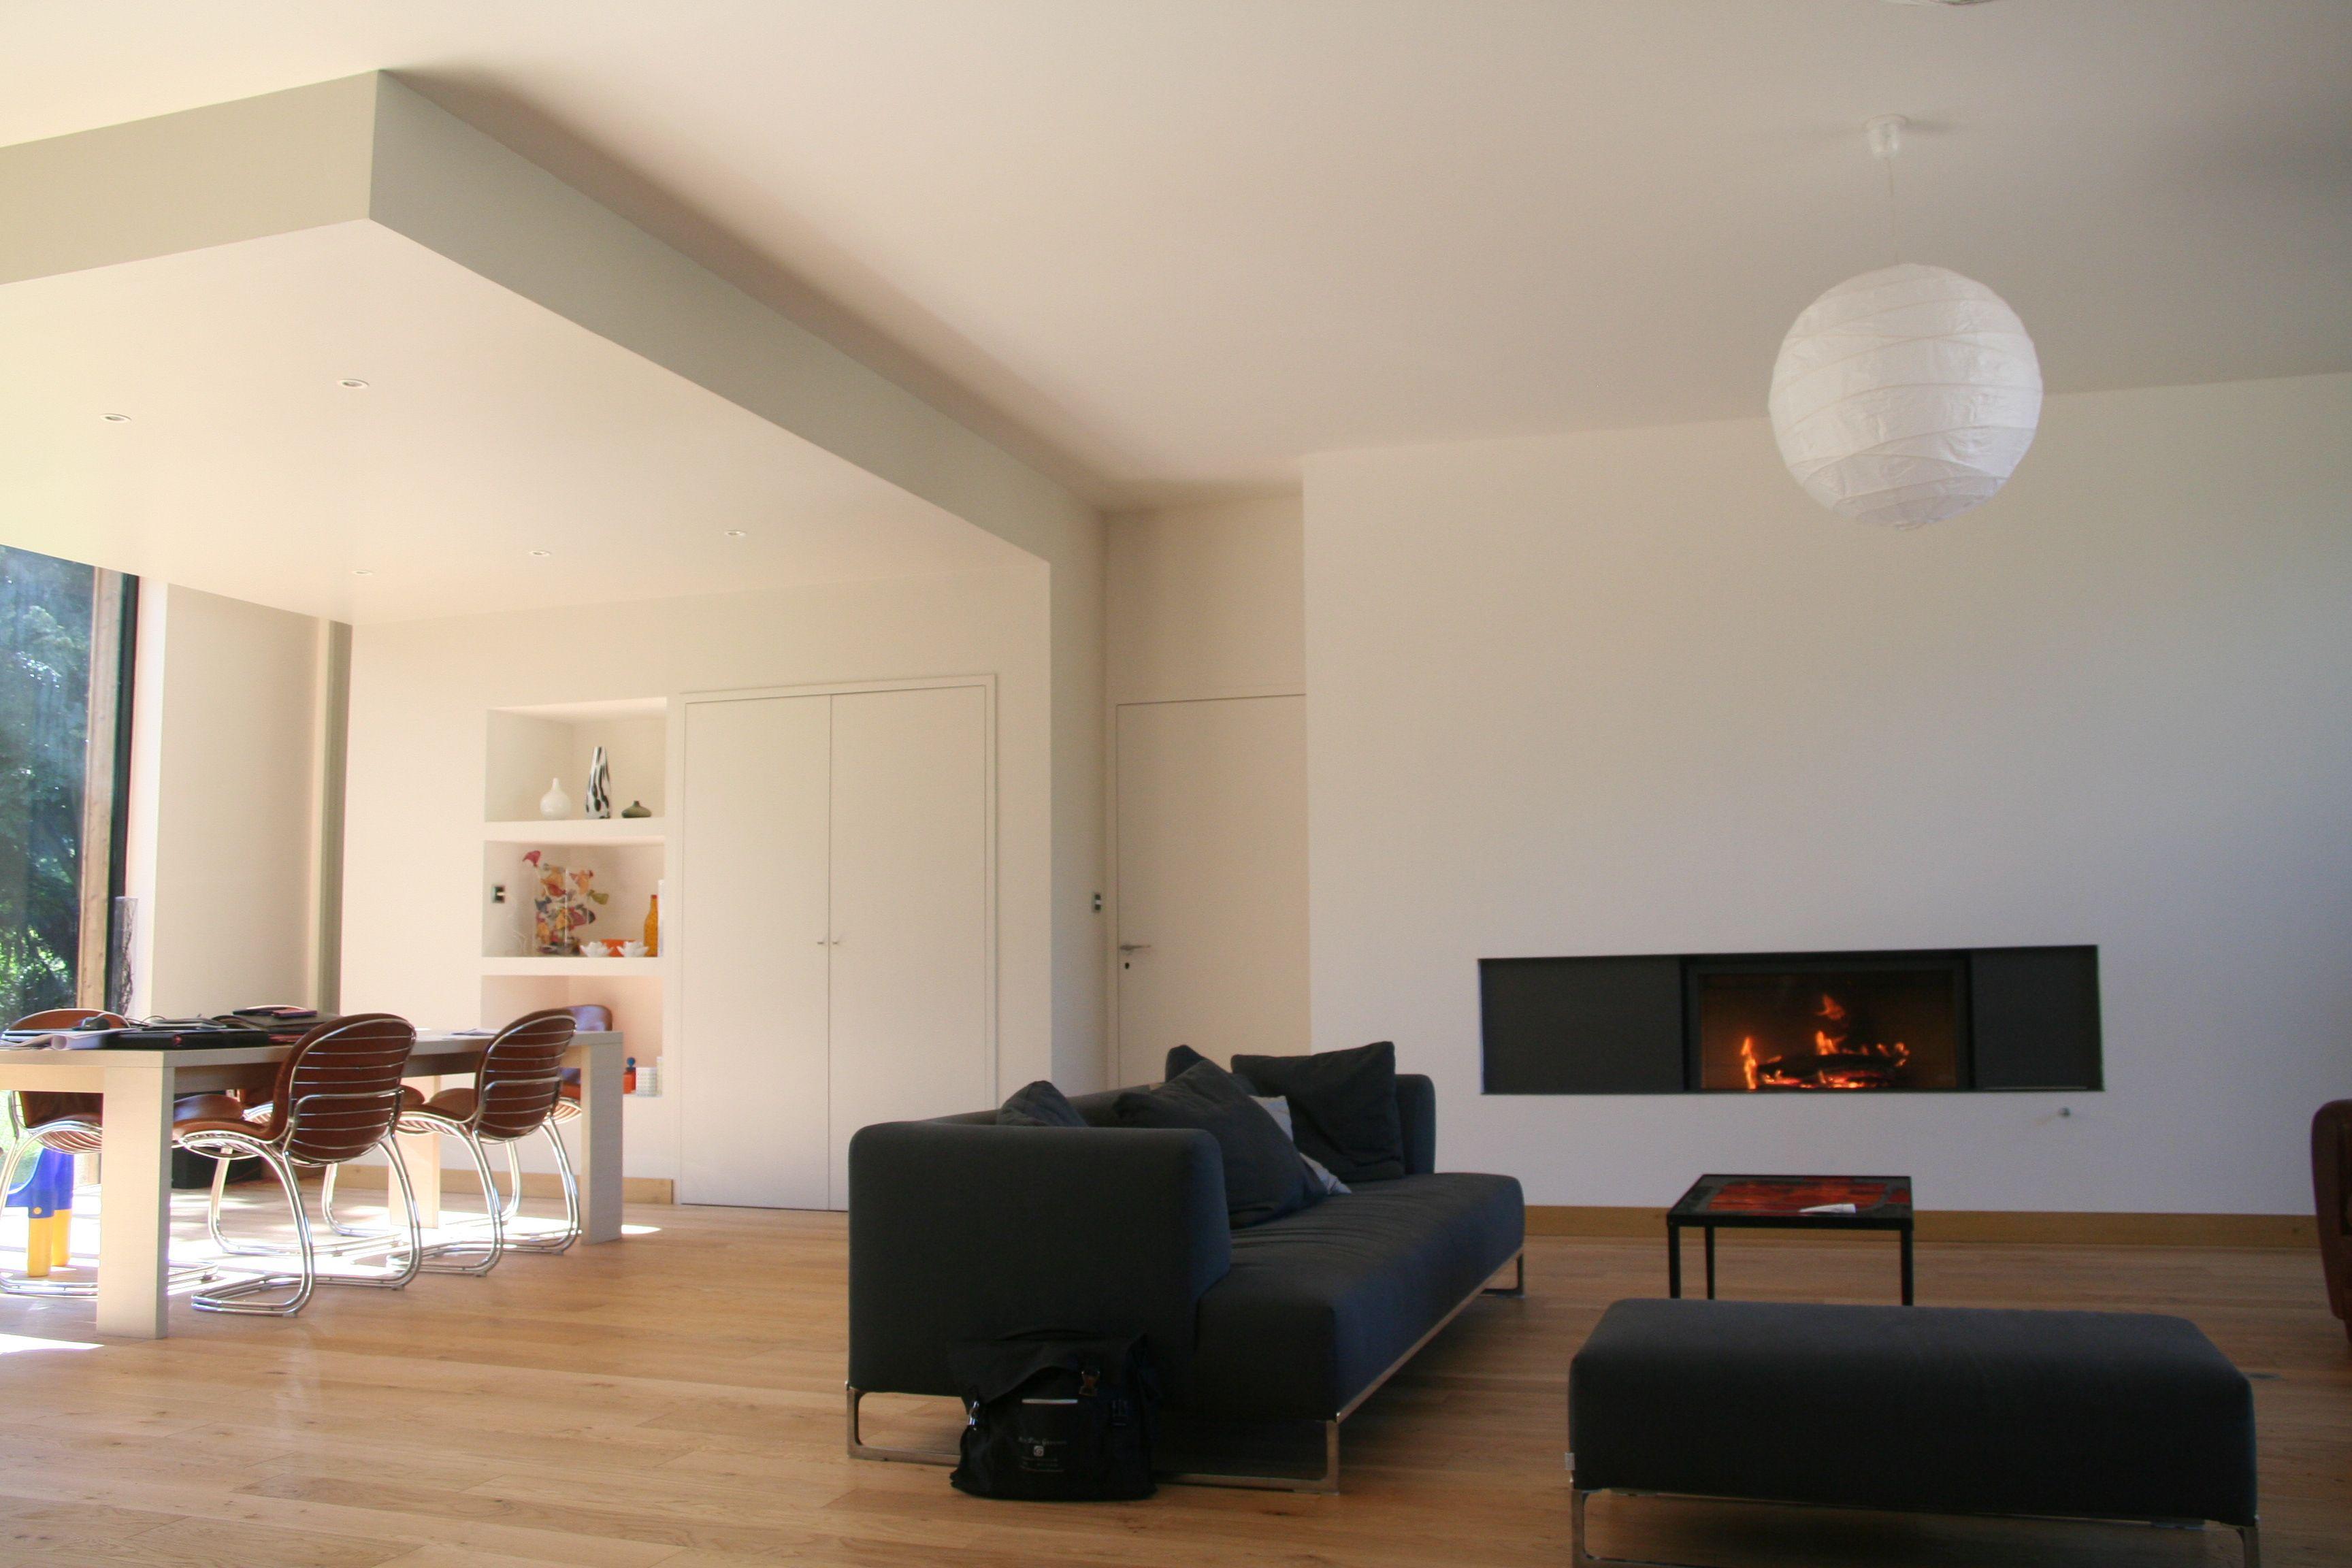 Stuv 21 105 Home Fireplace Inserts Wood Burning Stove